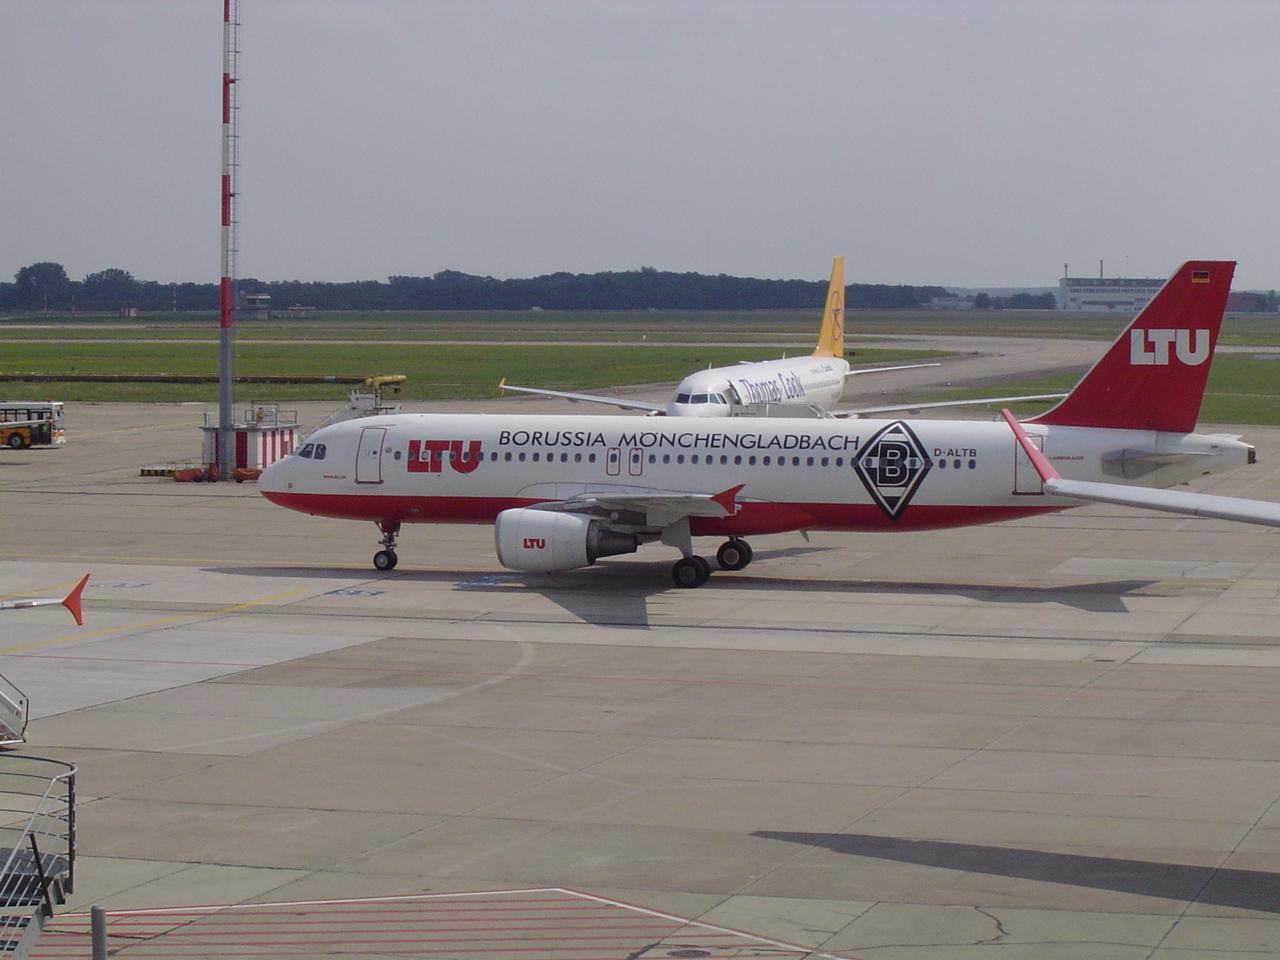 airbusa320ltumnchenglgzj09.jpg